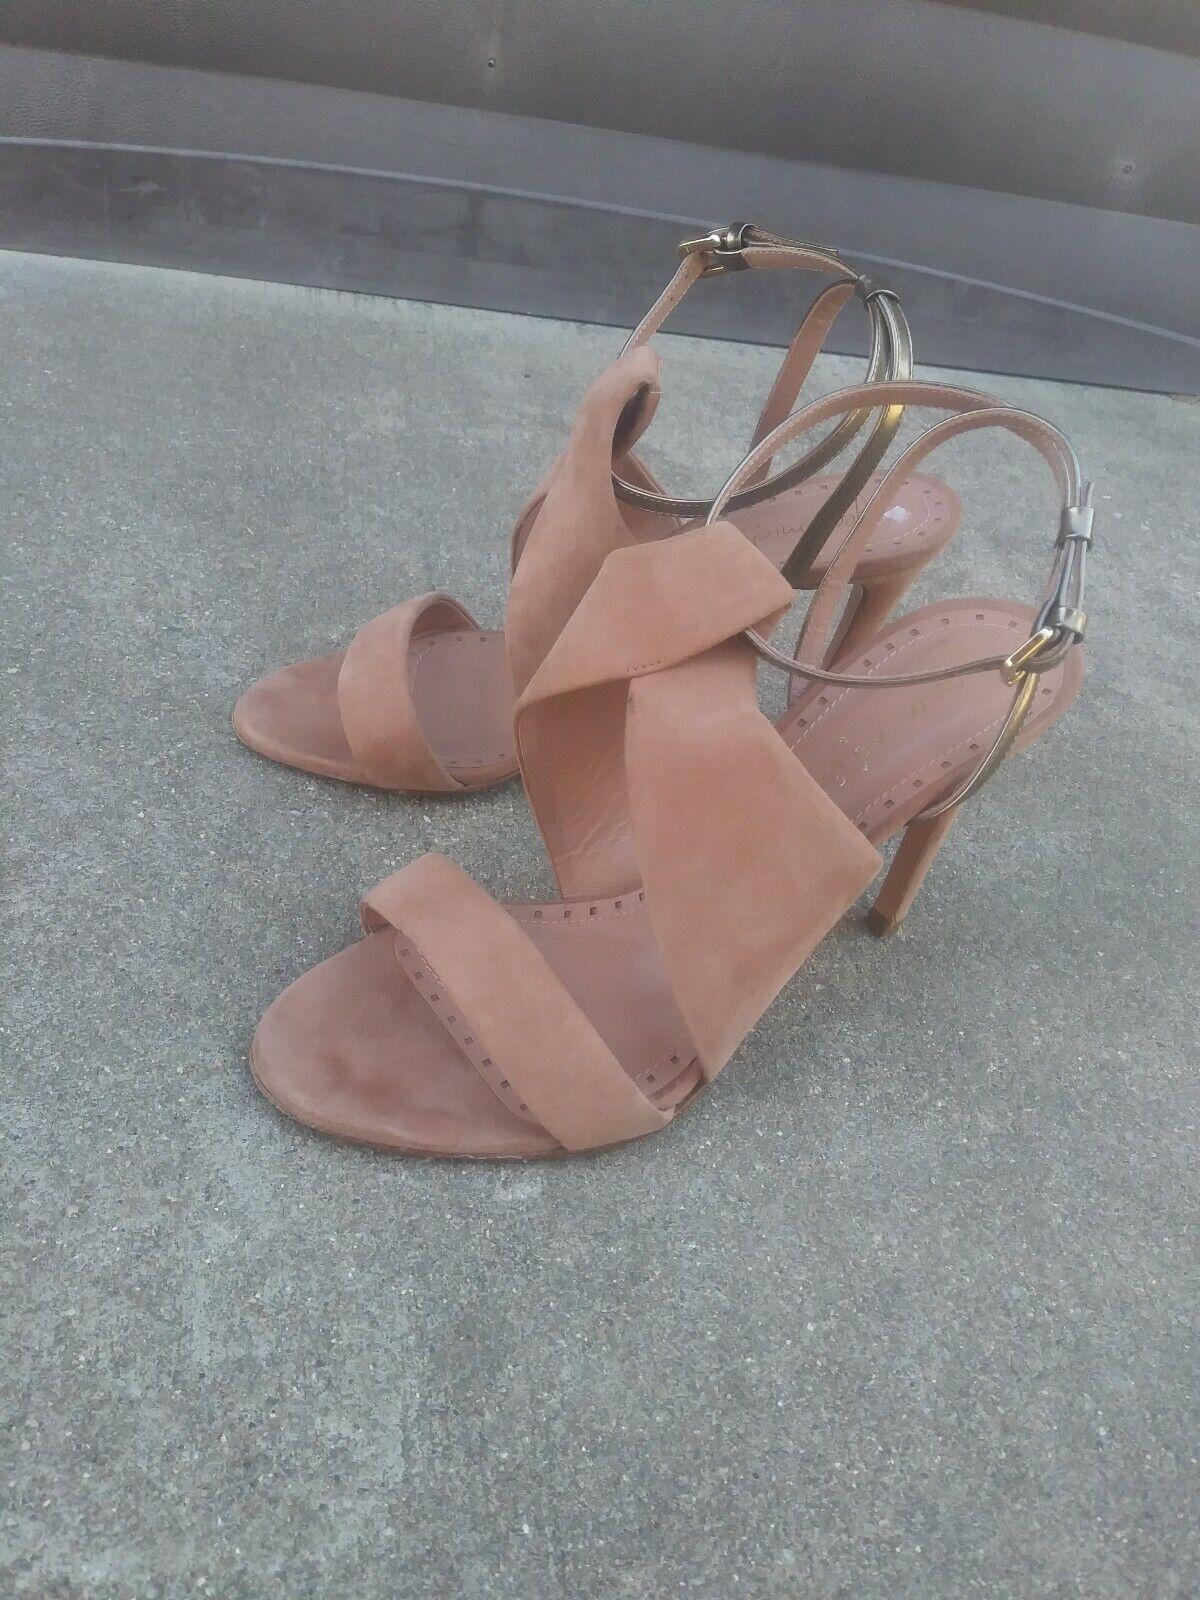 Jean Michel Cazabat Olga Twist bluesh Suede Sandals Heels Size 36